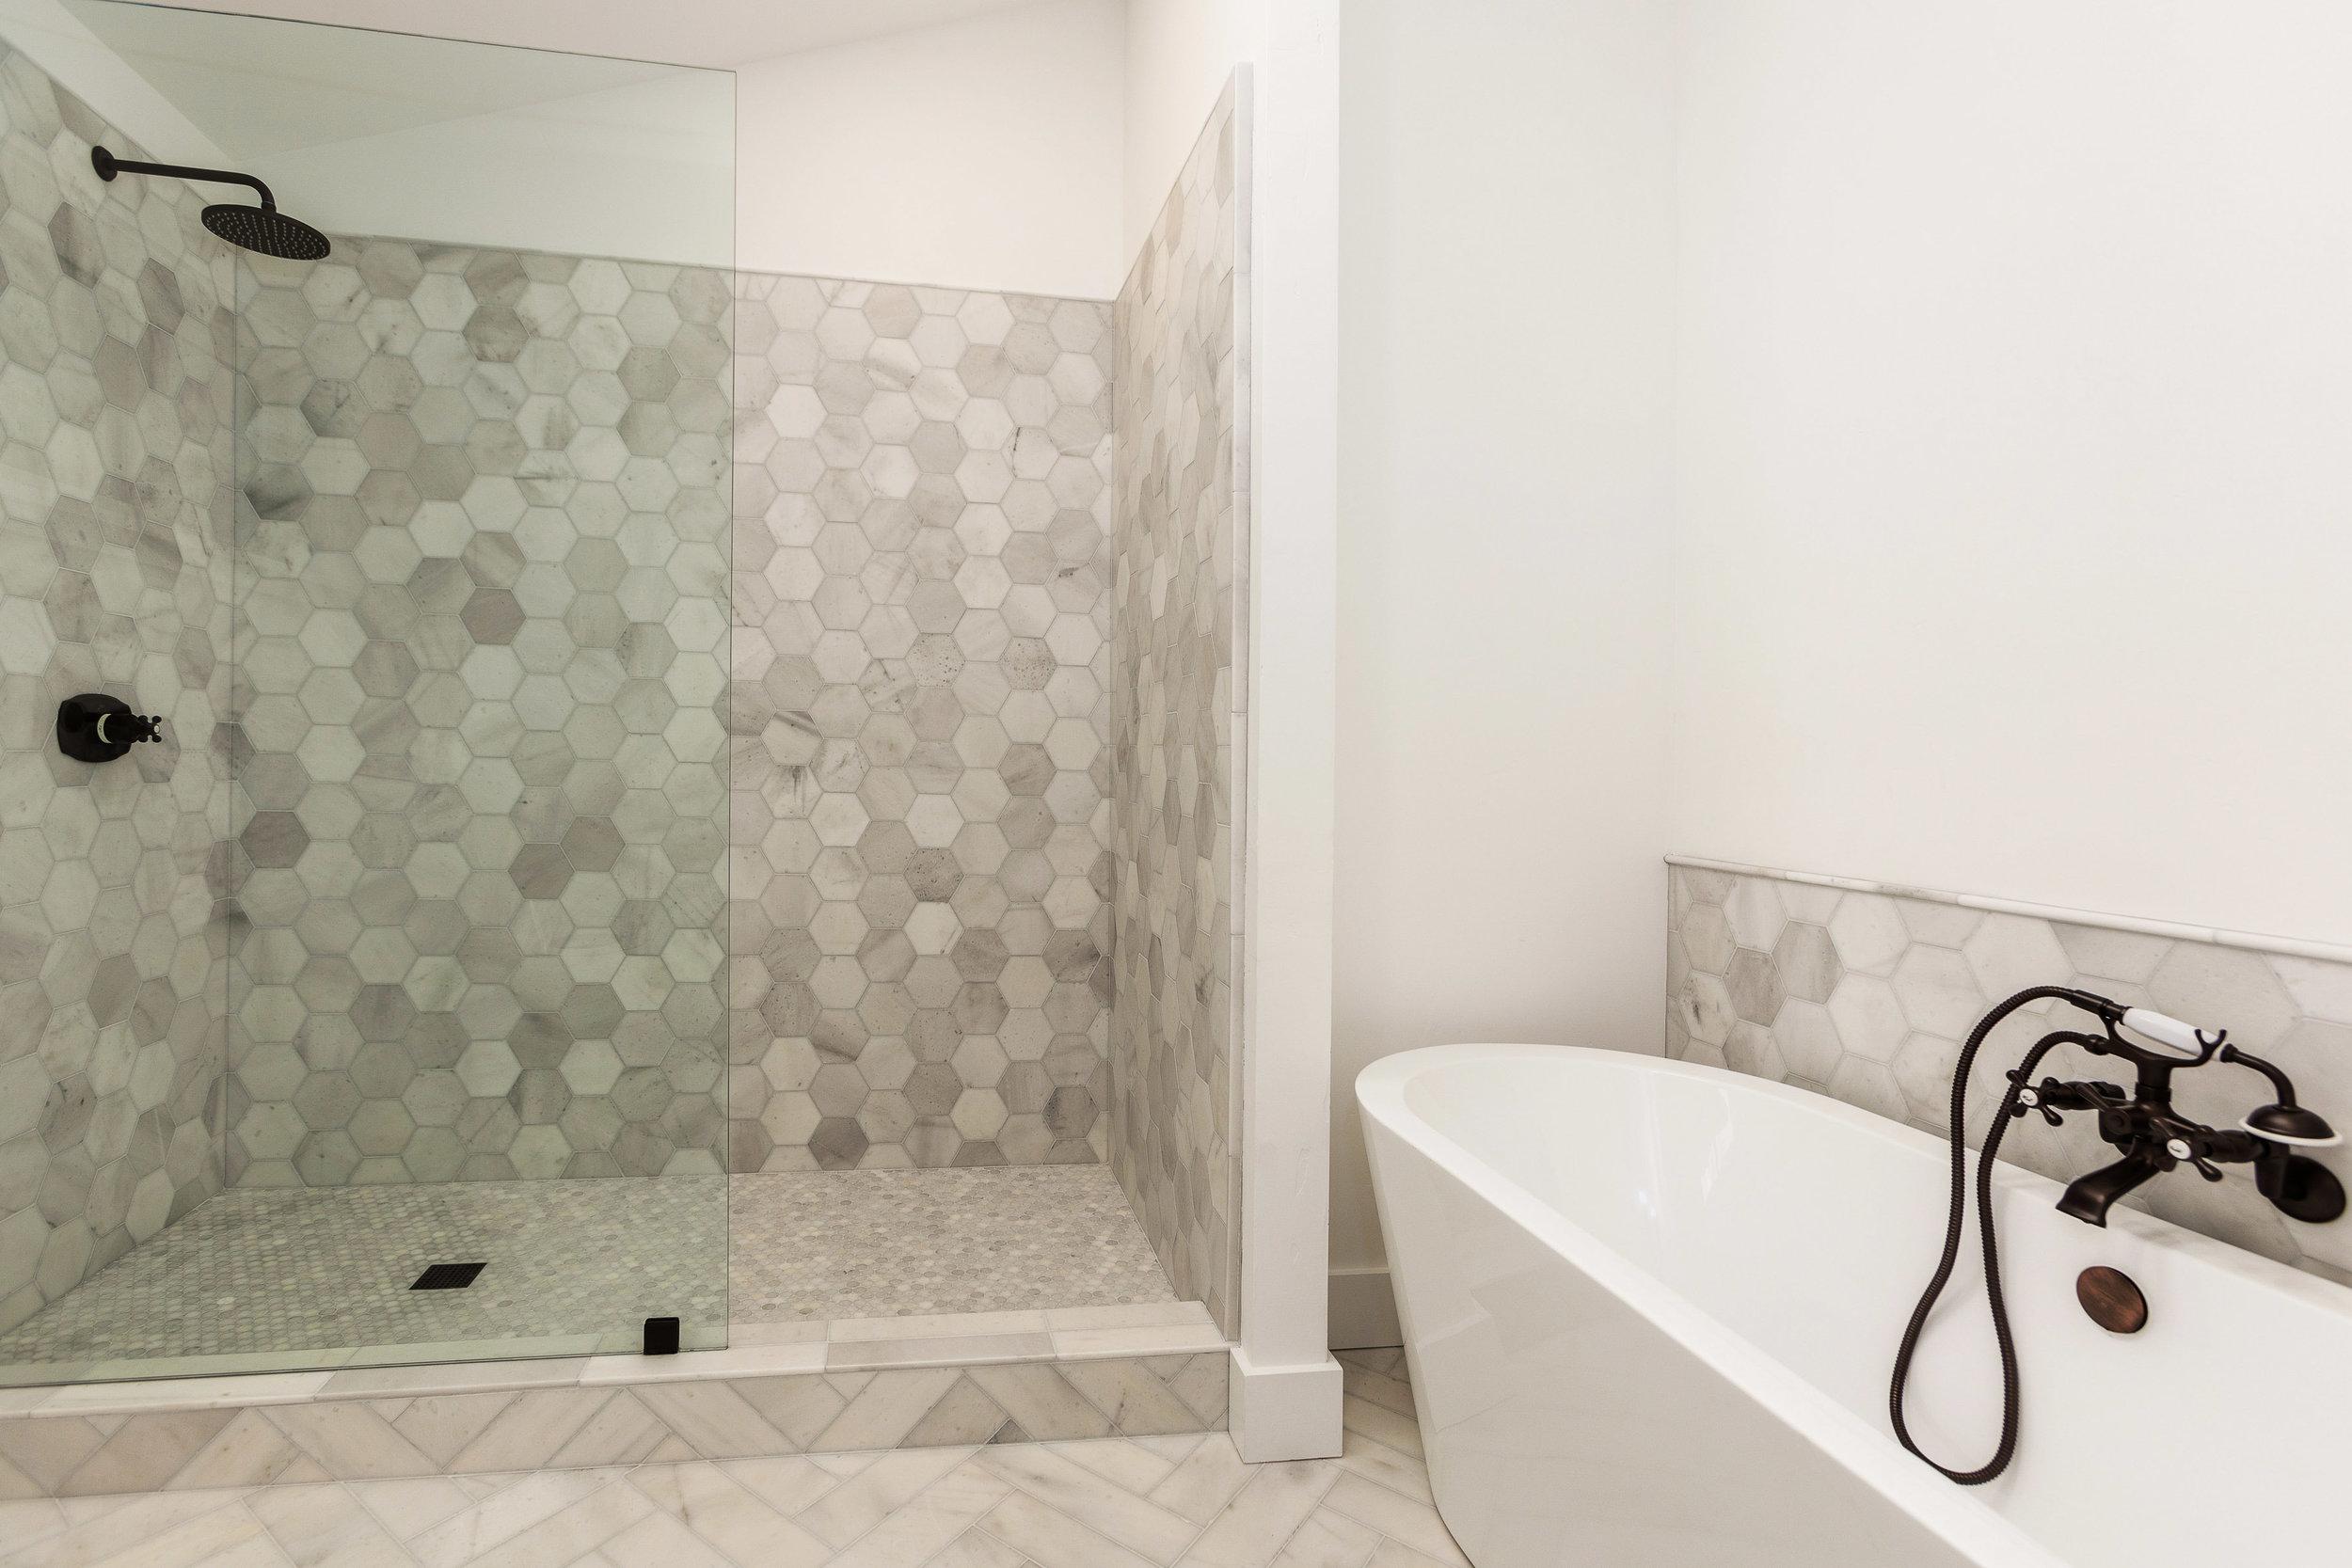 020_129-Bathroom.jpg